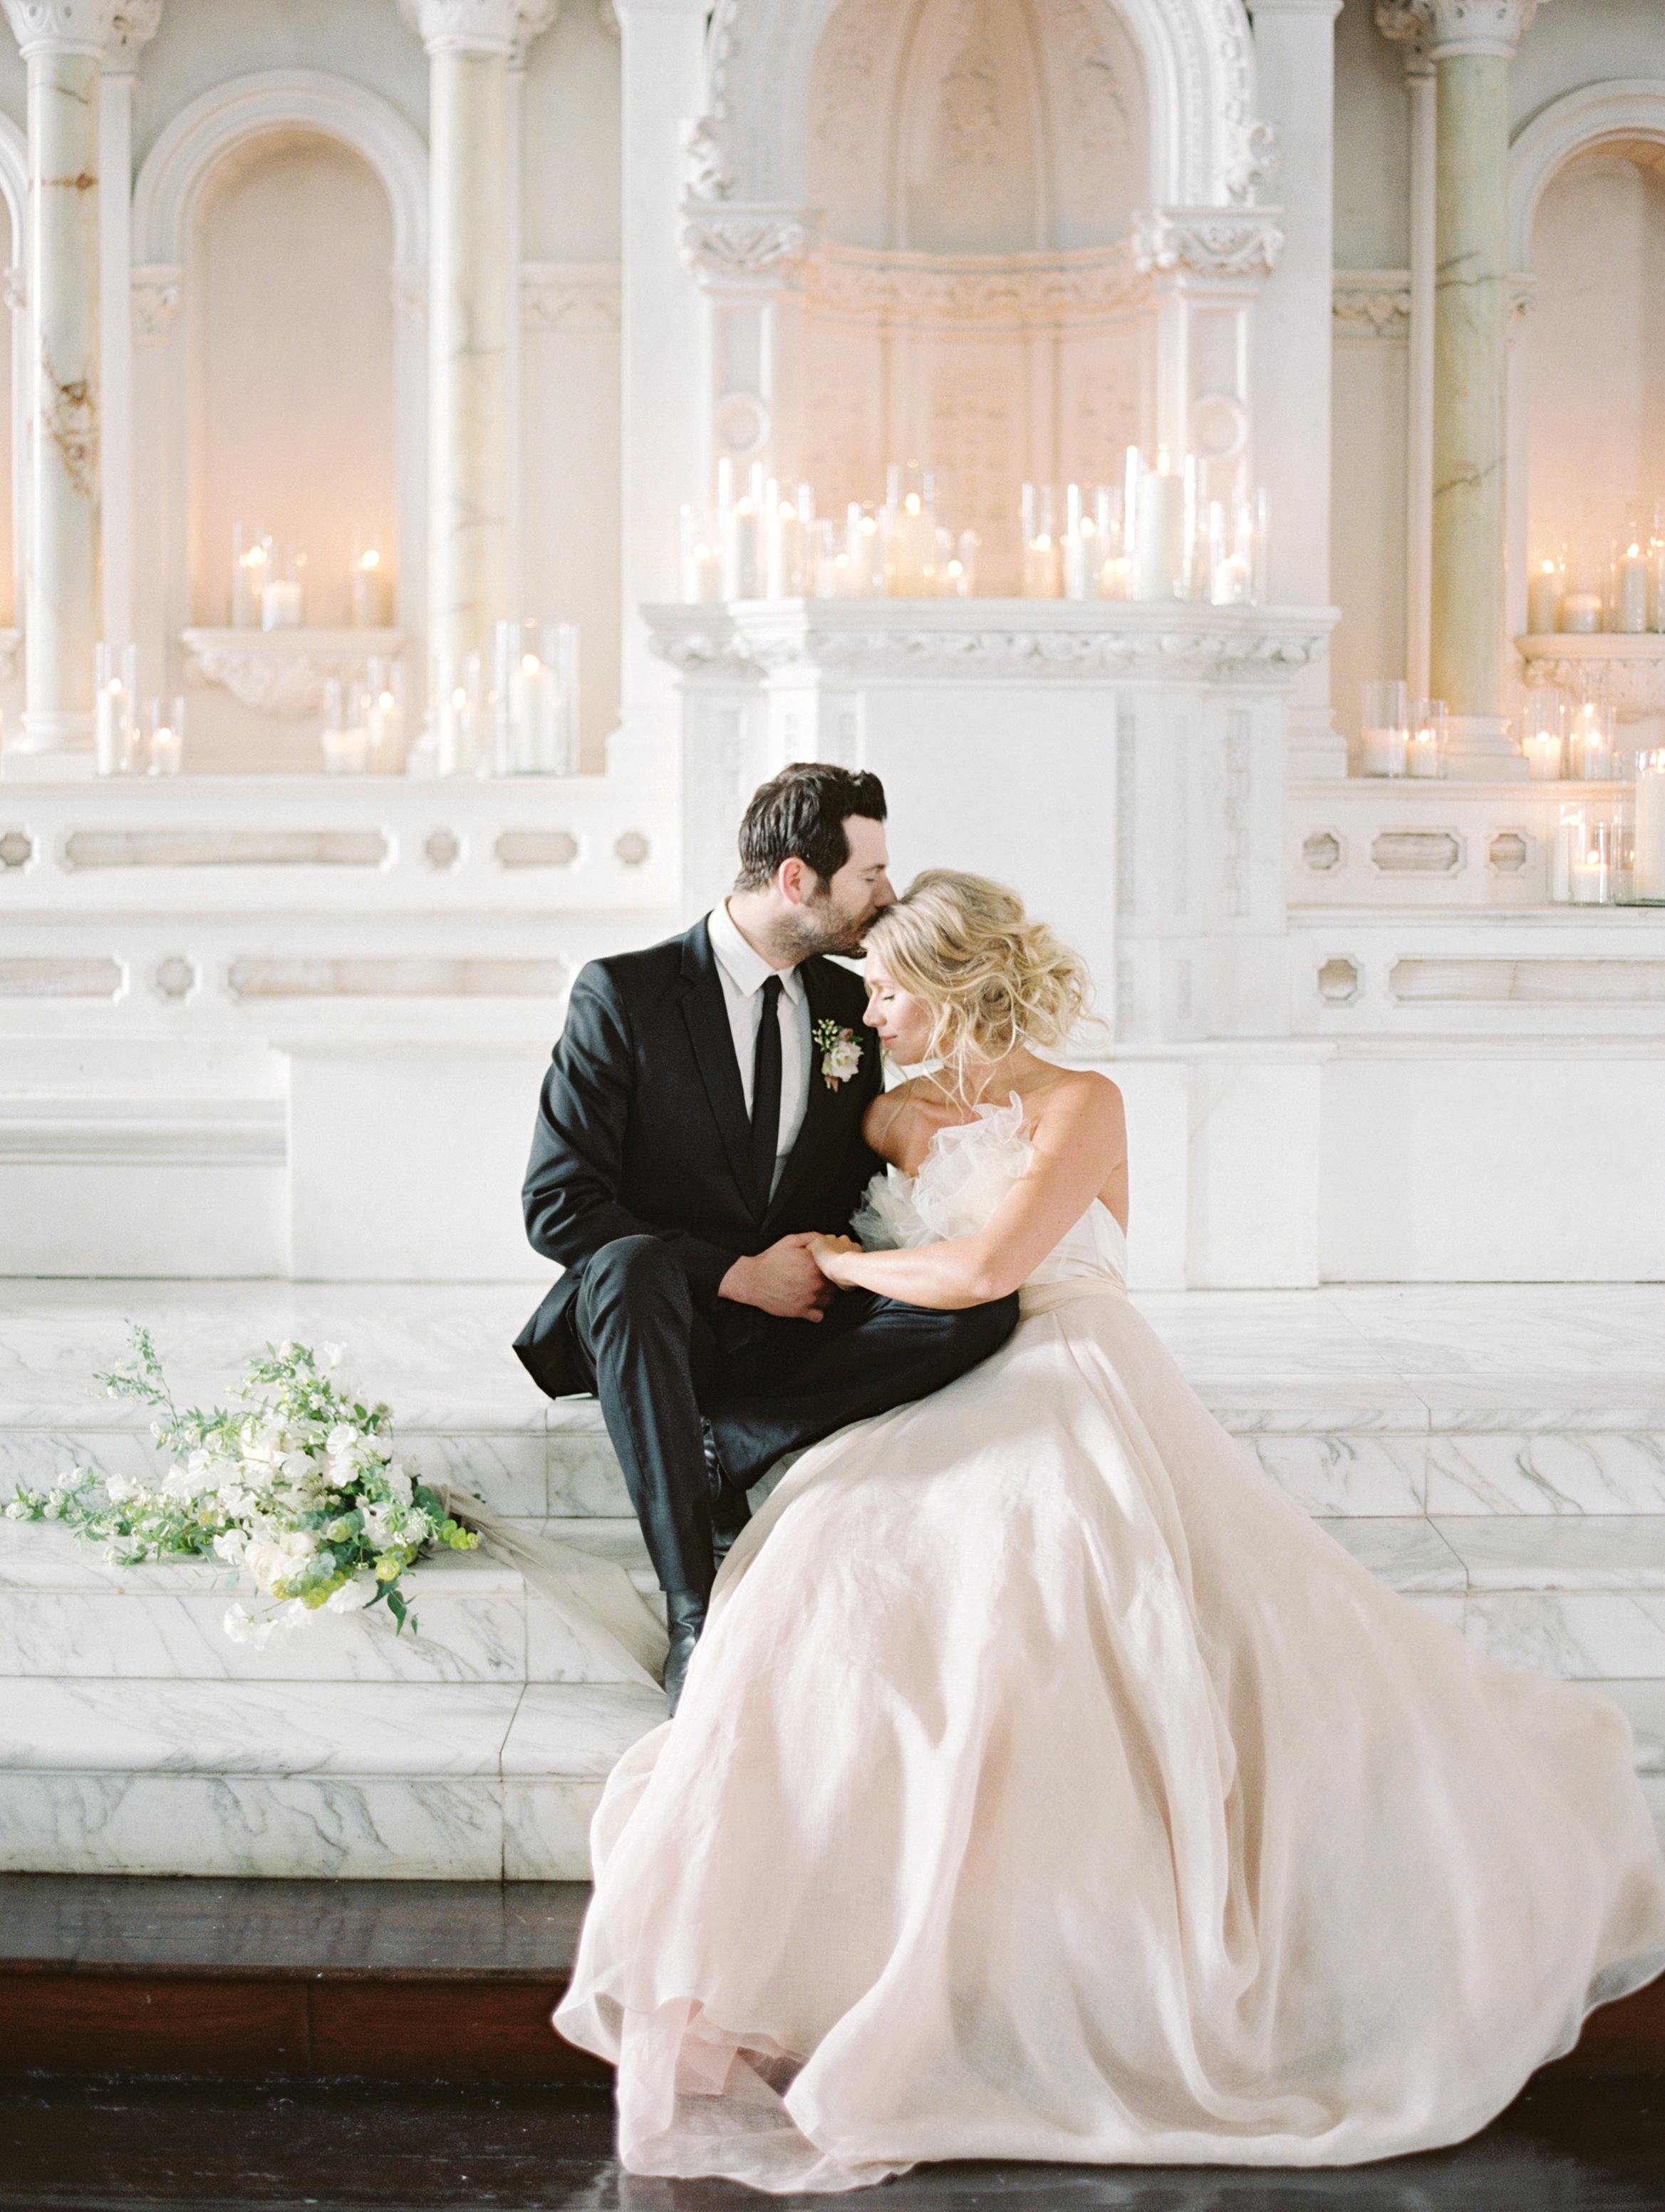 Carol Hannah Bridal Grand Palais Gown VibianabyValentinaGlidden_141.jpg